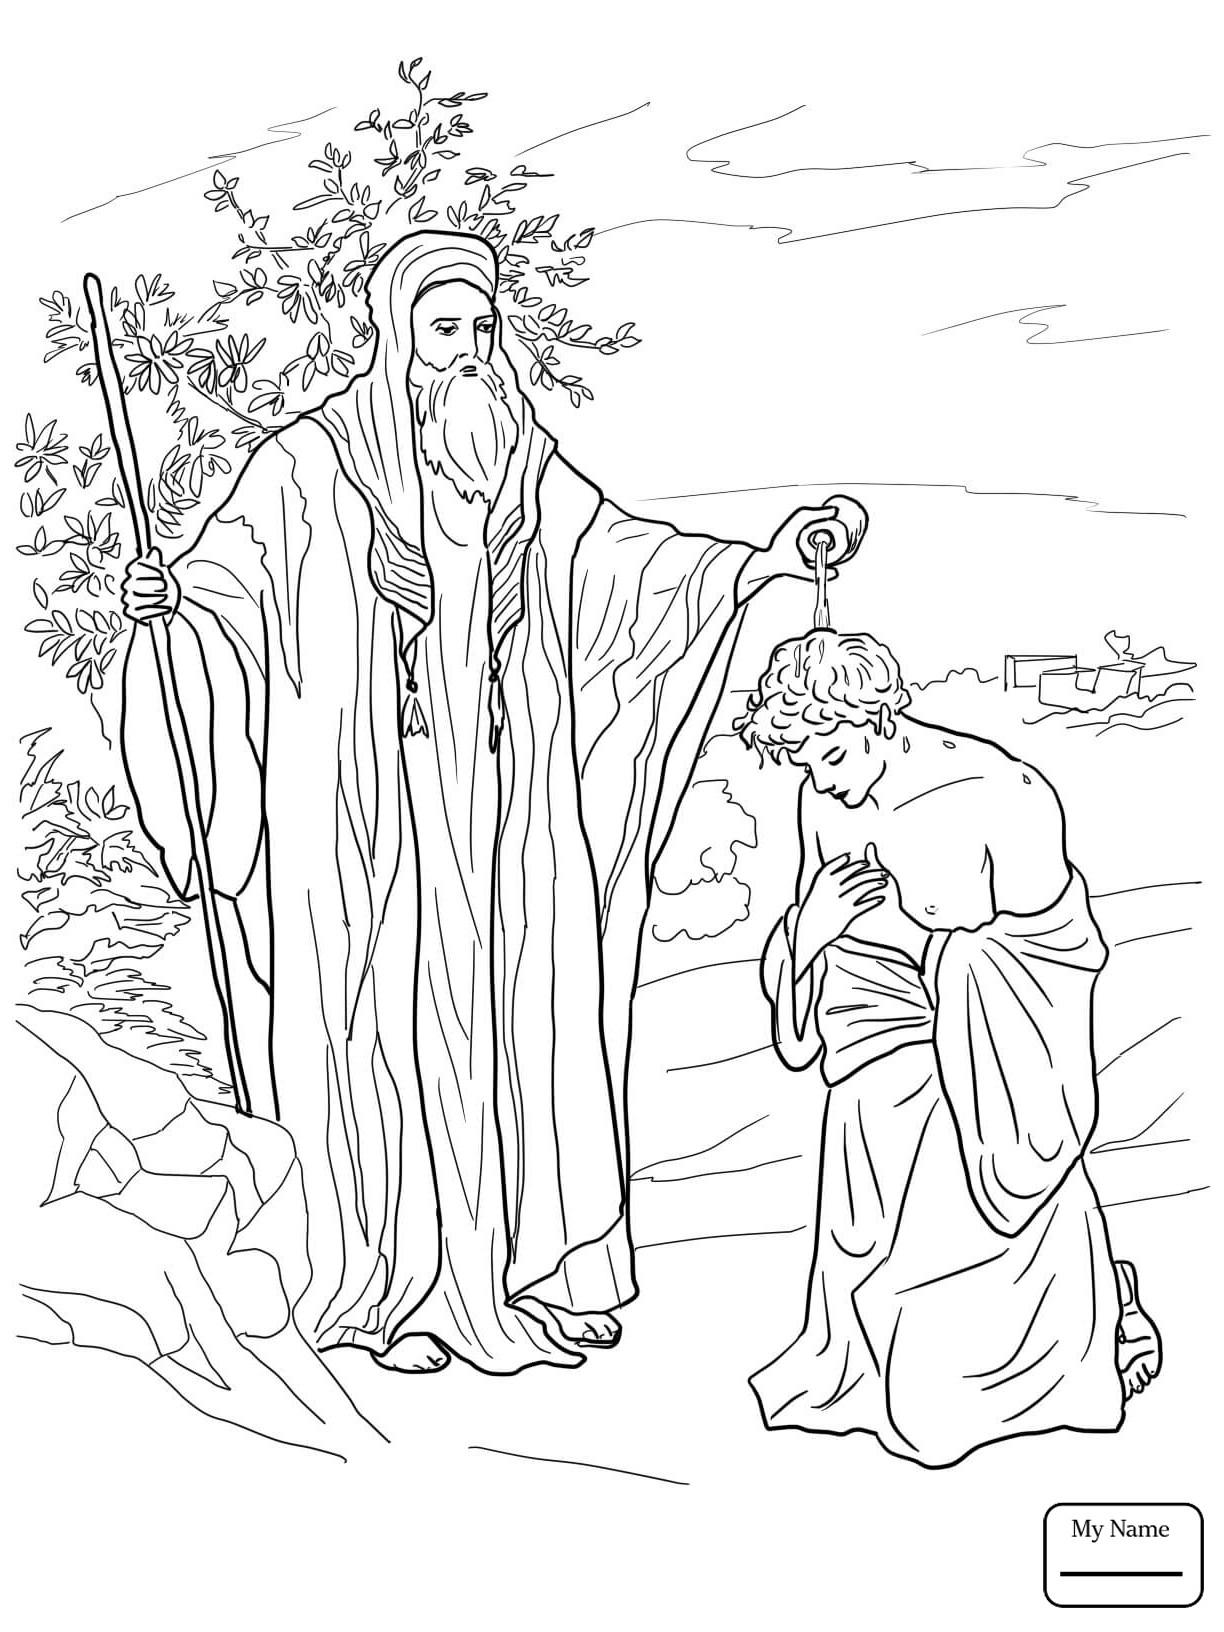 David And Saul Coloring Page At Getcolorings